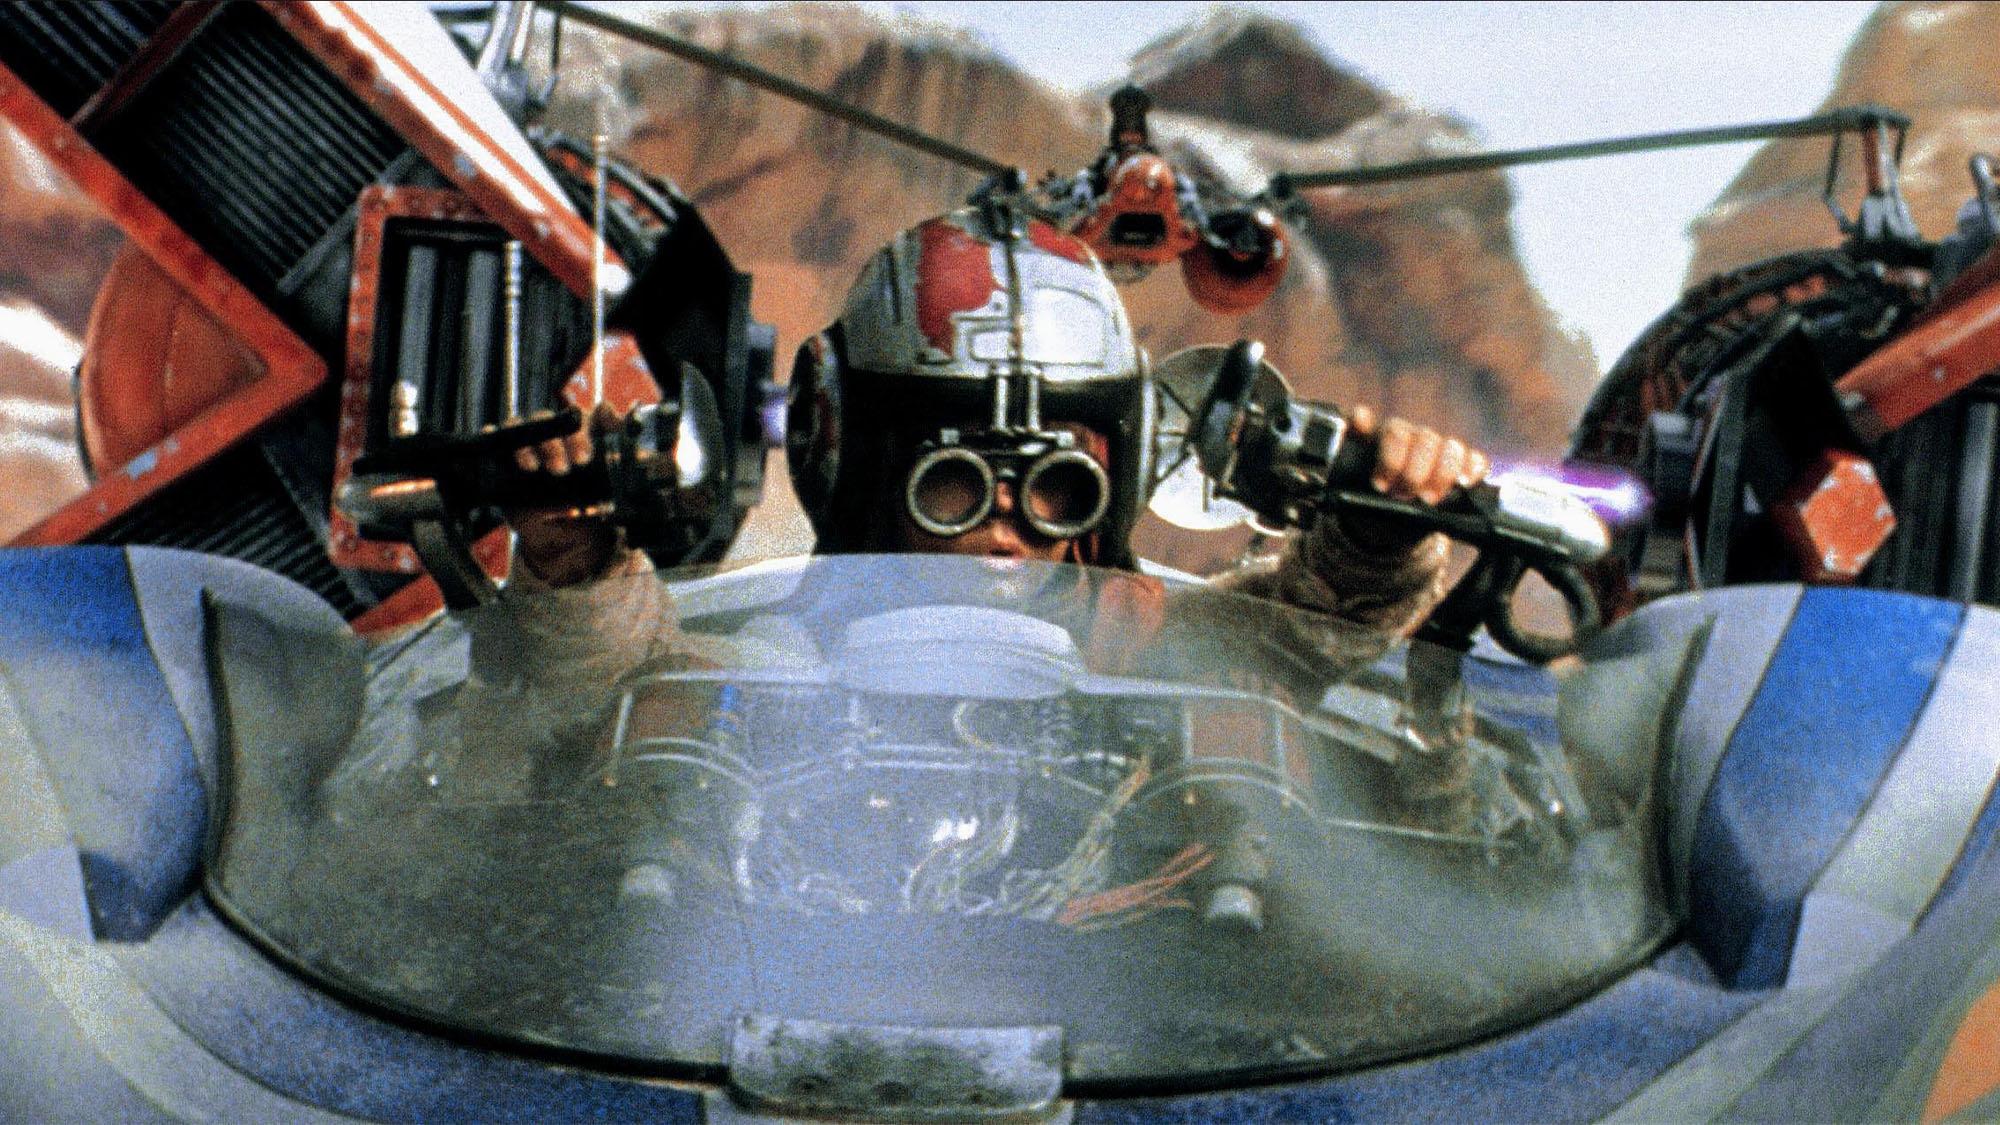 JAKE LLOYD AS ANAKIN SKYWALKER STAR WARS: EPISODE I - THE PHANTOM MENACE (1999)